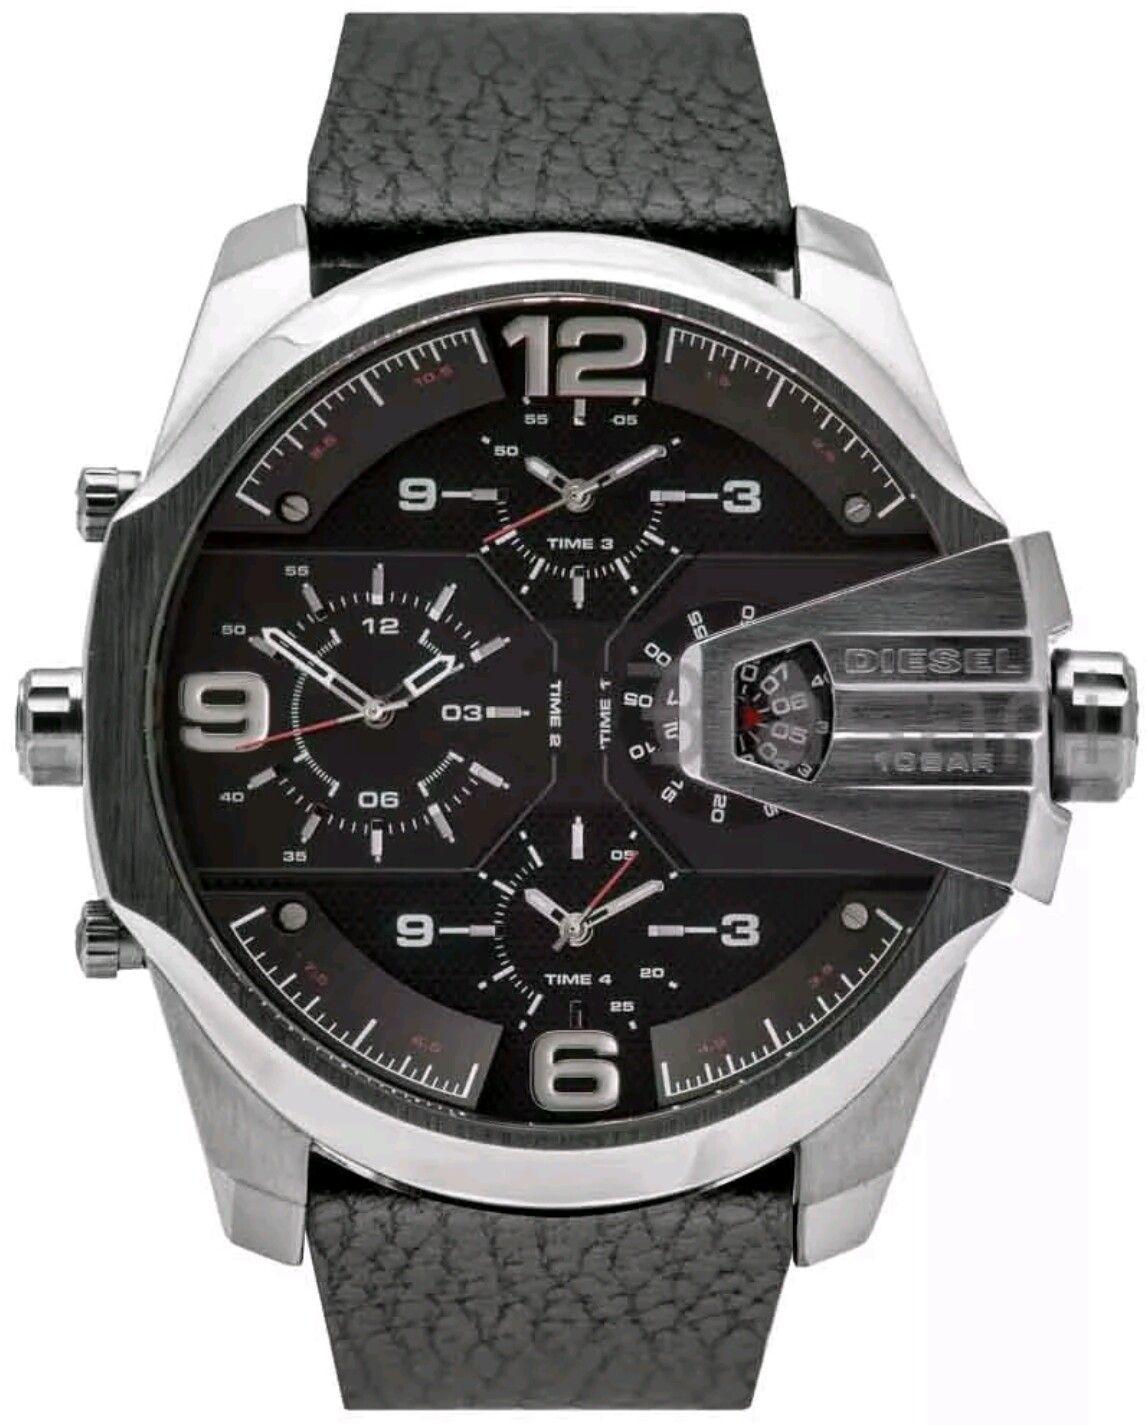 3930f69827bd DZ 7376 Reloj Diesel